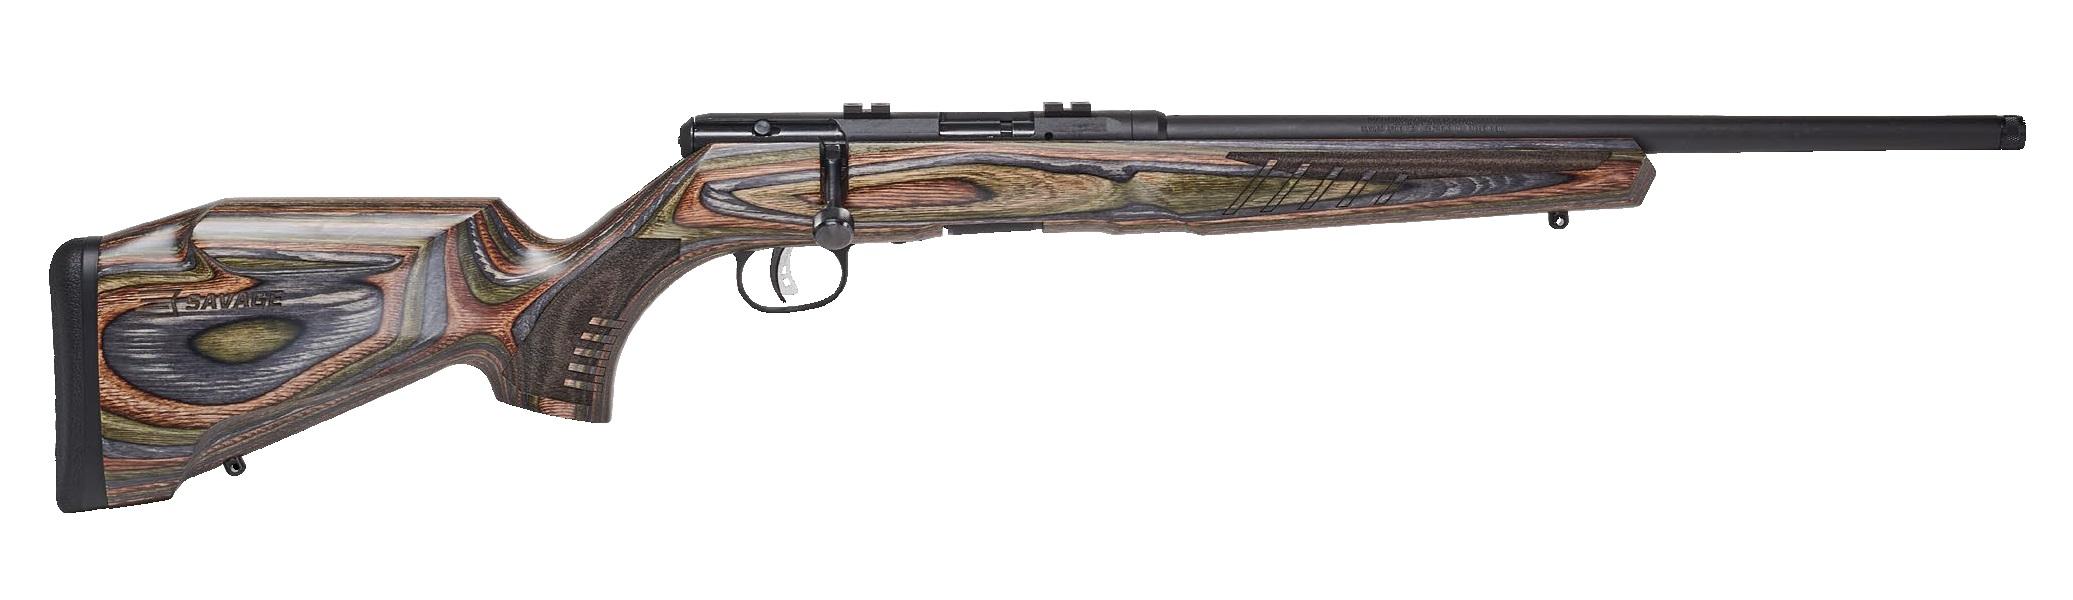 Savage Arms B22 BNS-SR 22 LR